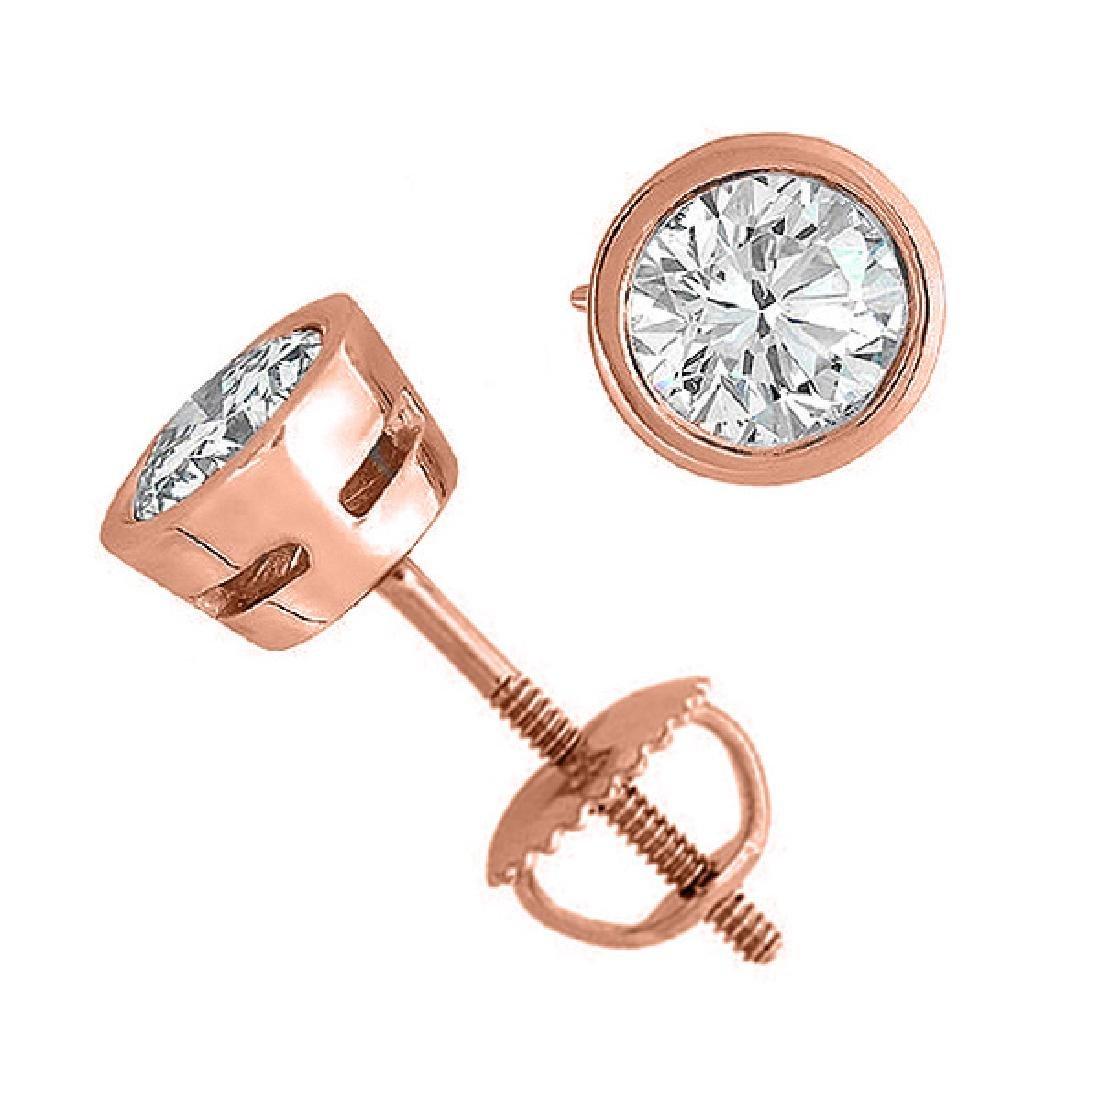 14K Rose Gold Jewelry 2.01 ctw Natural Diamond Stud